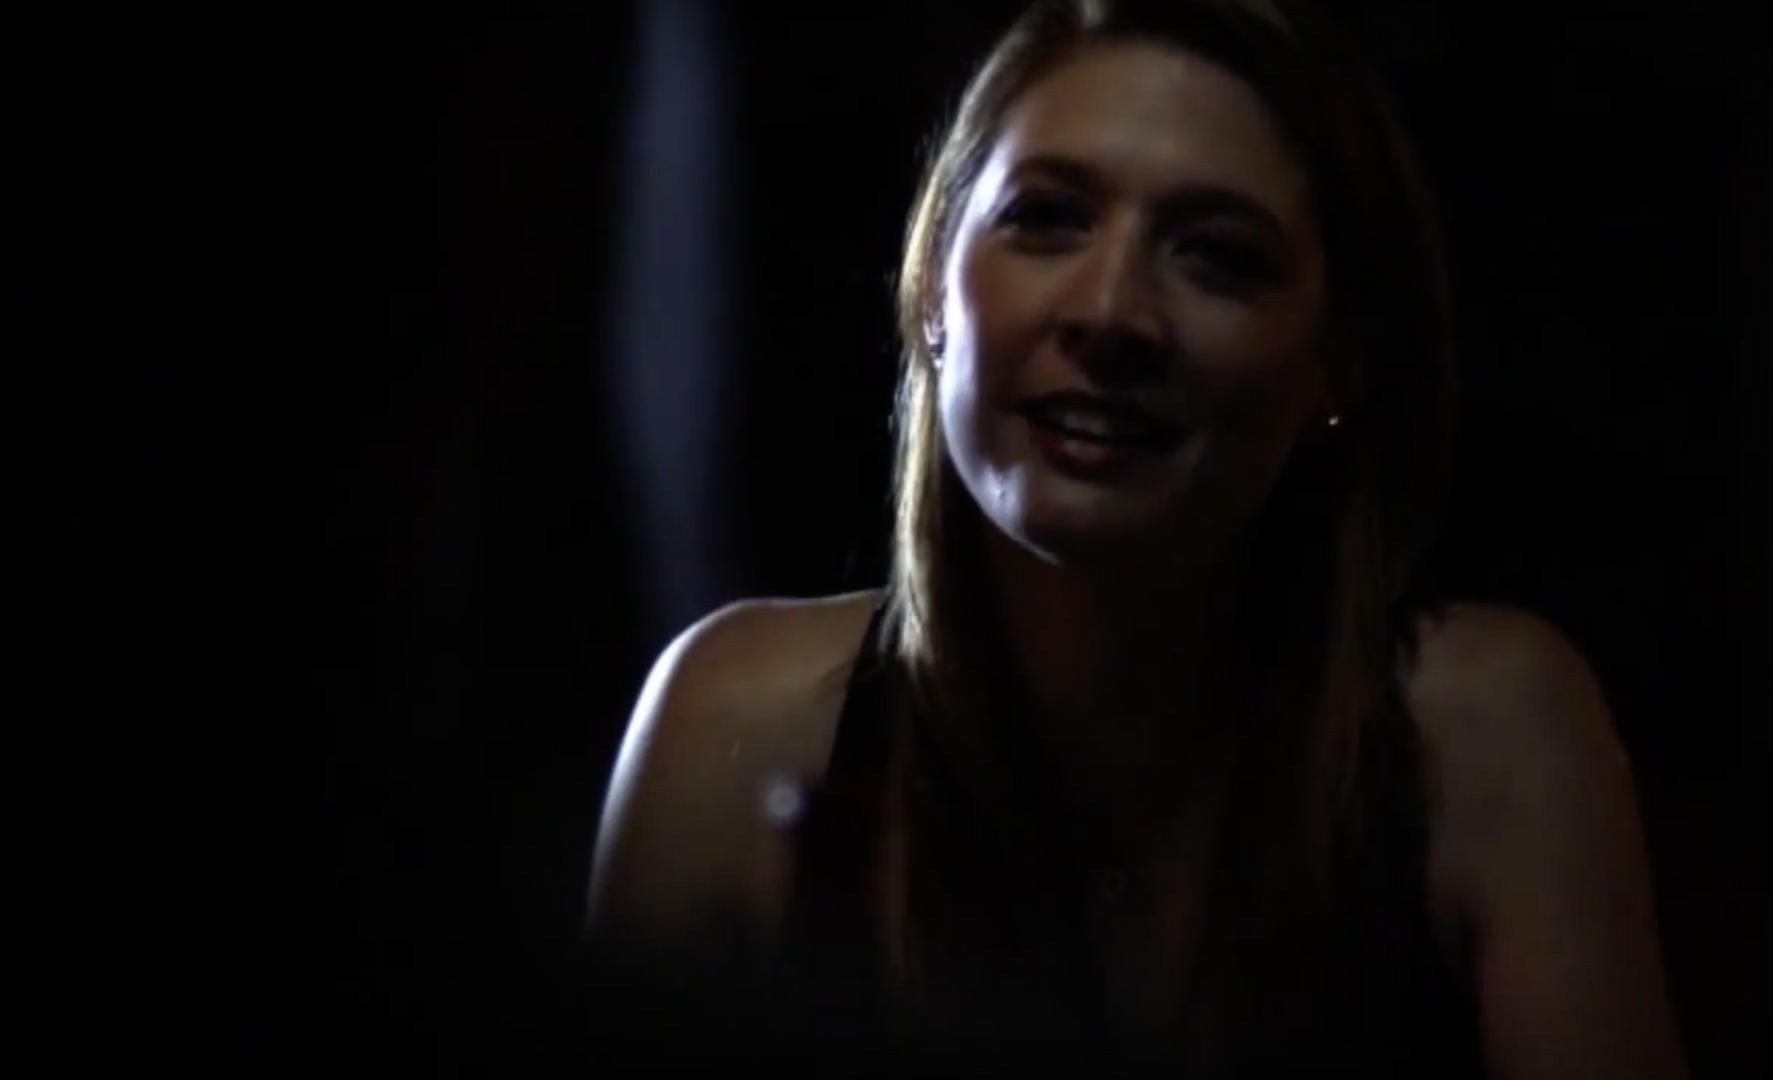 Shades of Gray. Cast: Rachel McKinney